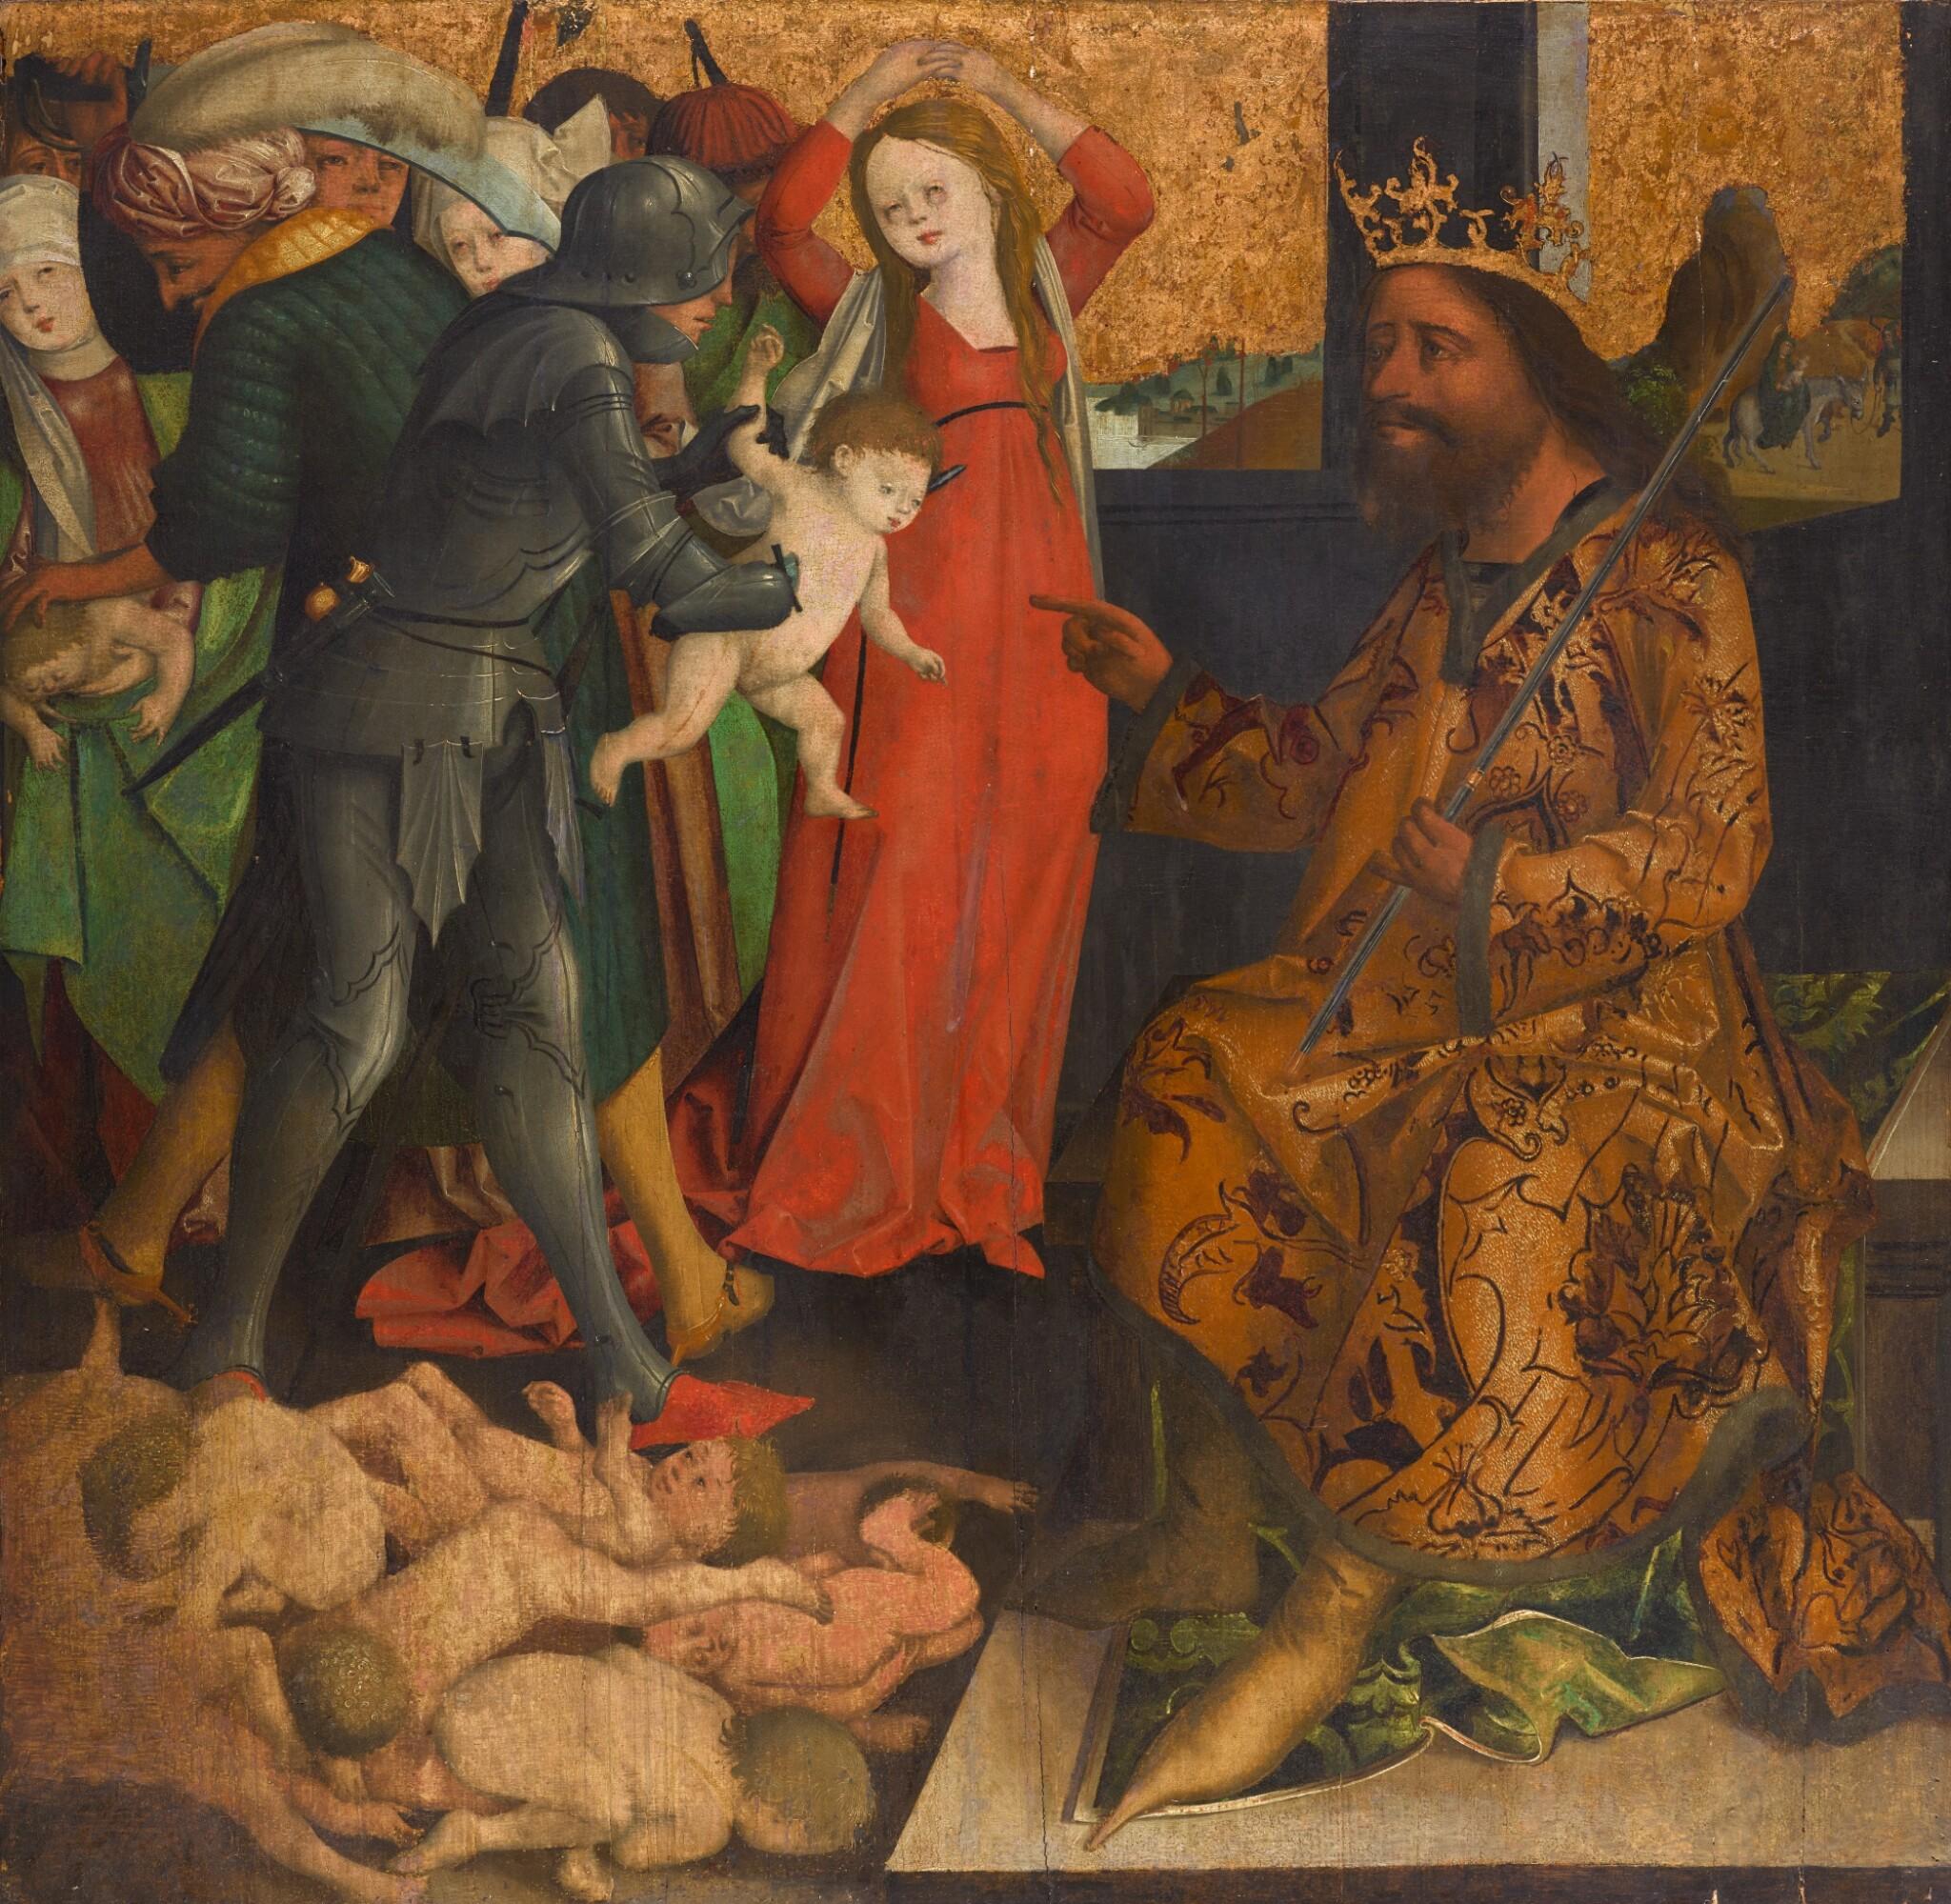 MASTER OF THE KRAINBURG ALTARPIECE | The Massacre of the Innocents